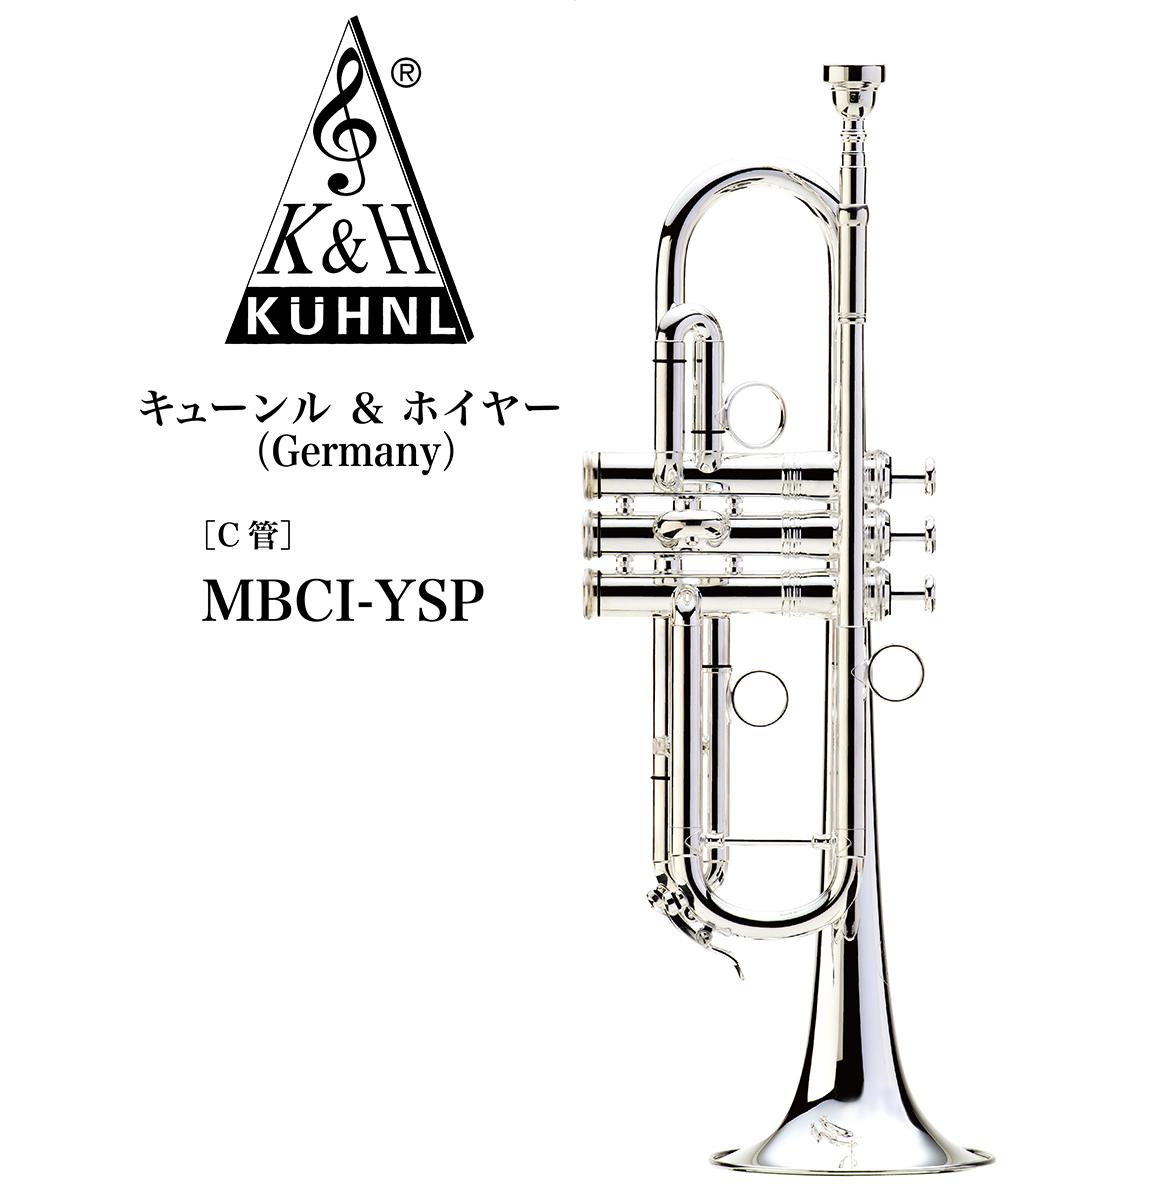 C管トランペット K&H(Germany)MBCI-YSP<マルテブルバシリーズ>